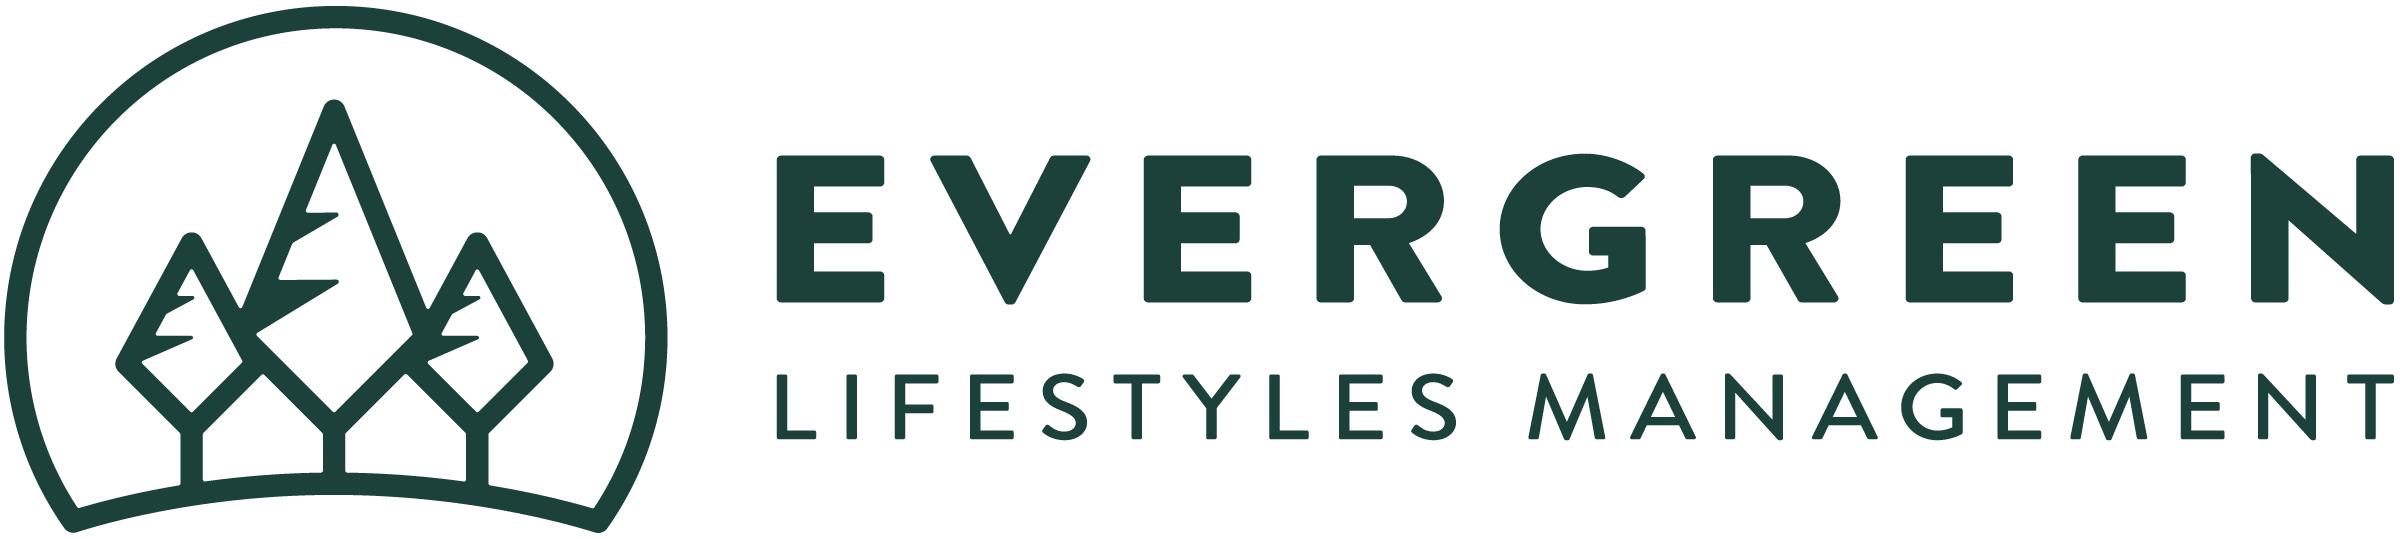 logo-left-green_large